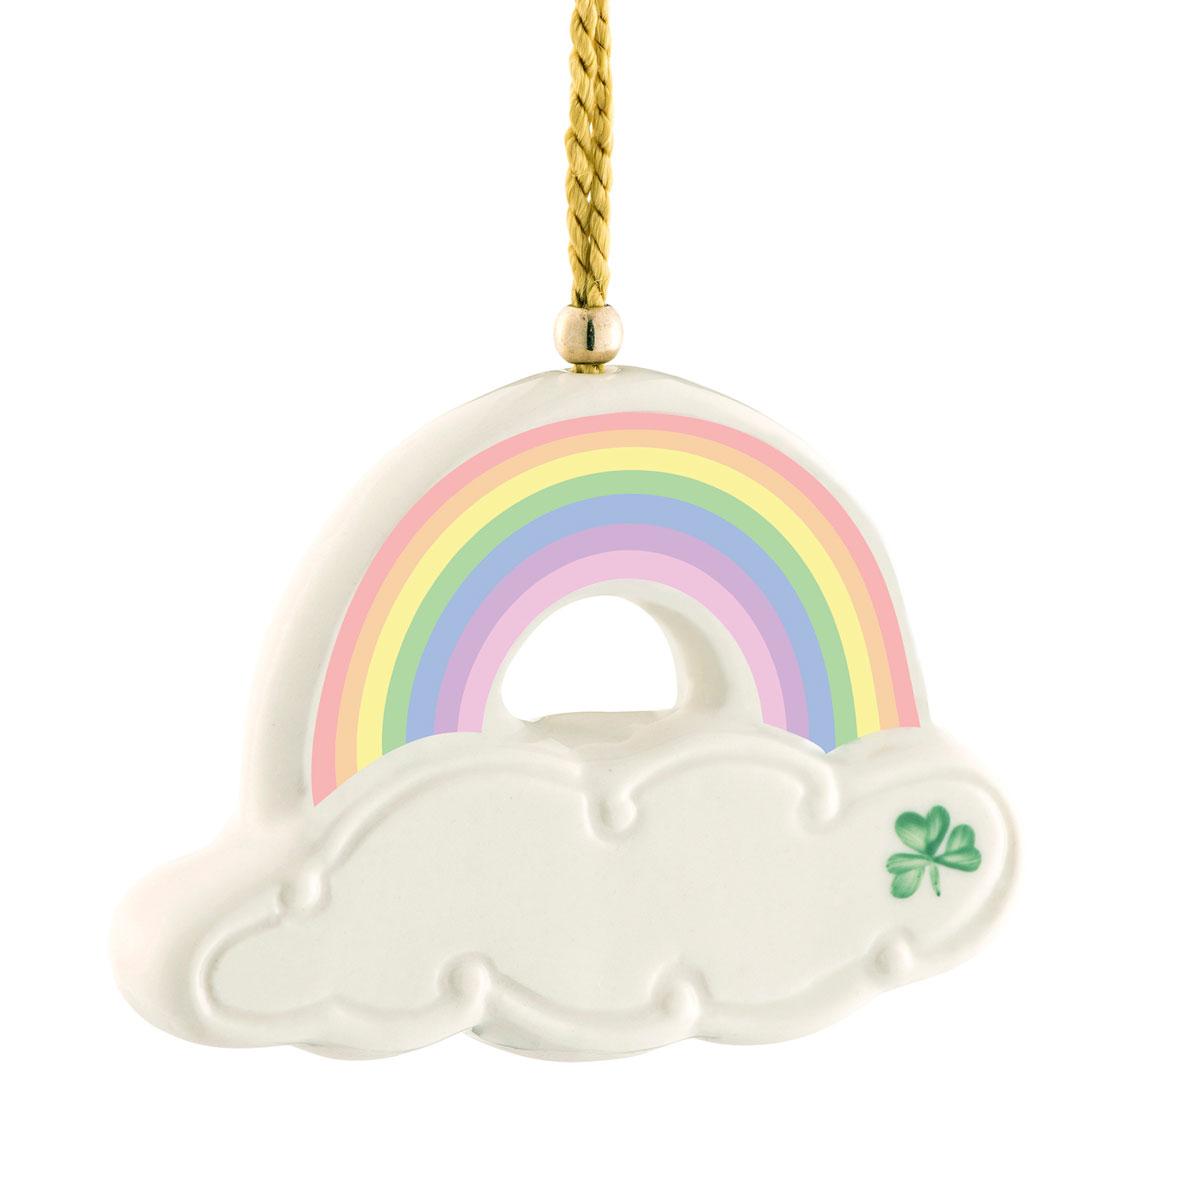 Belleek China Rainbow Ornament